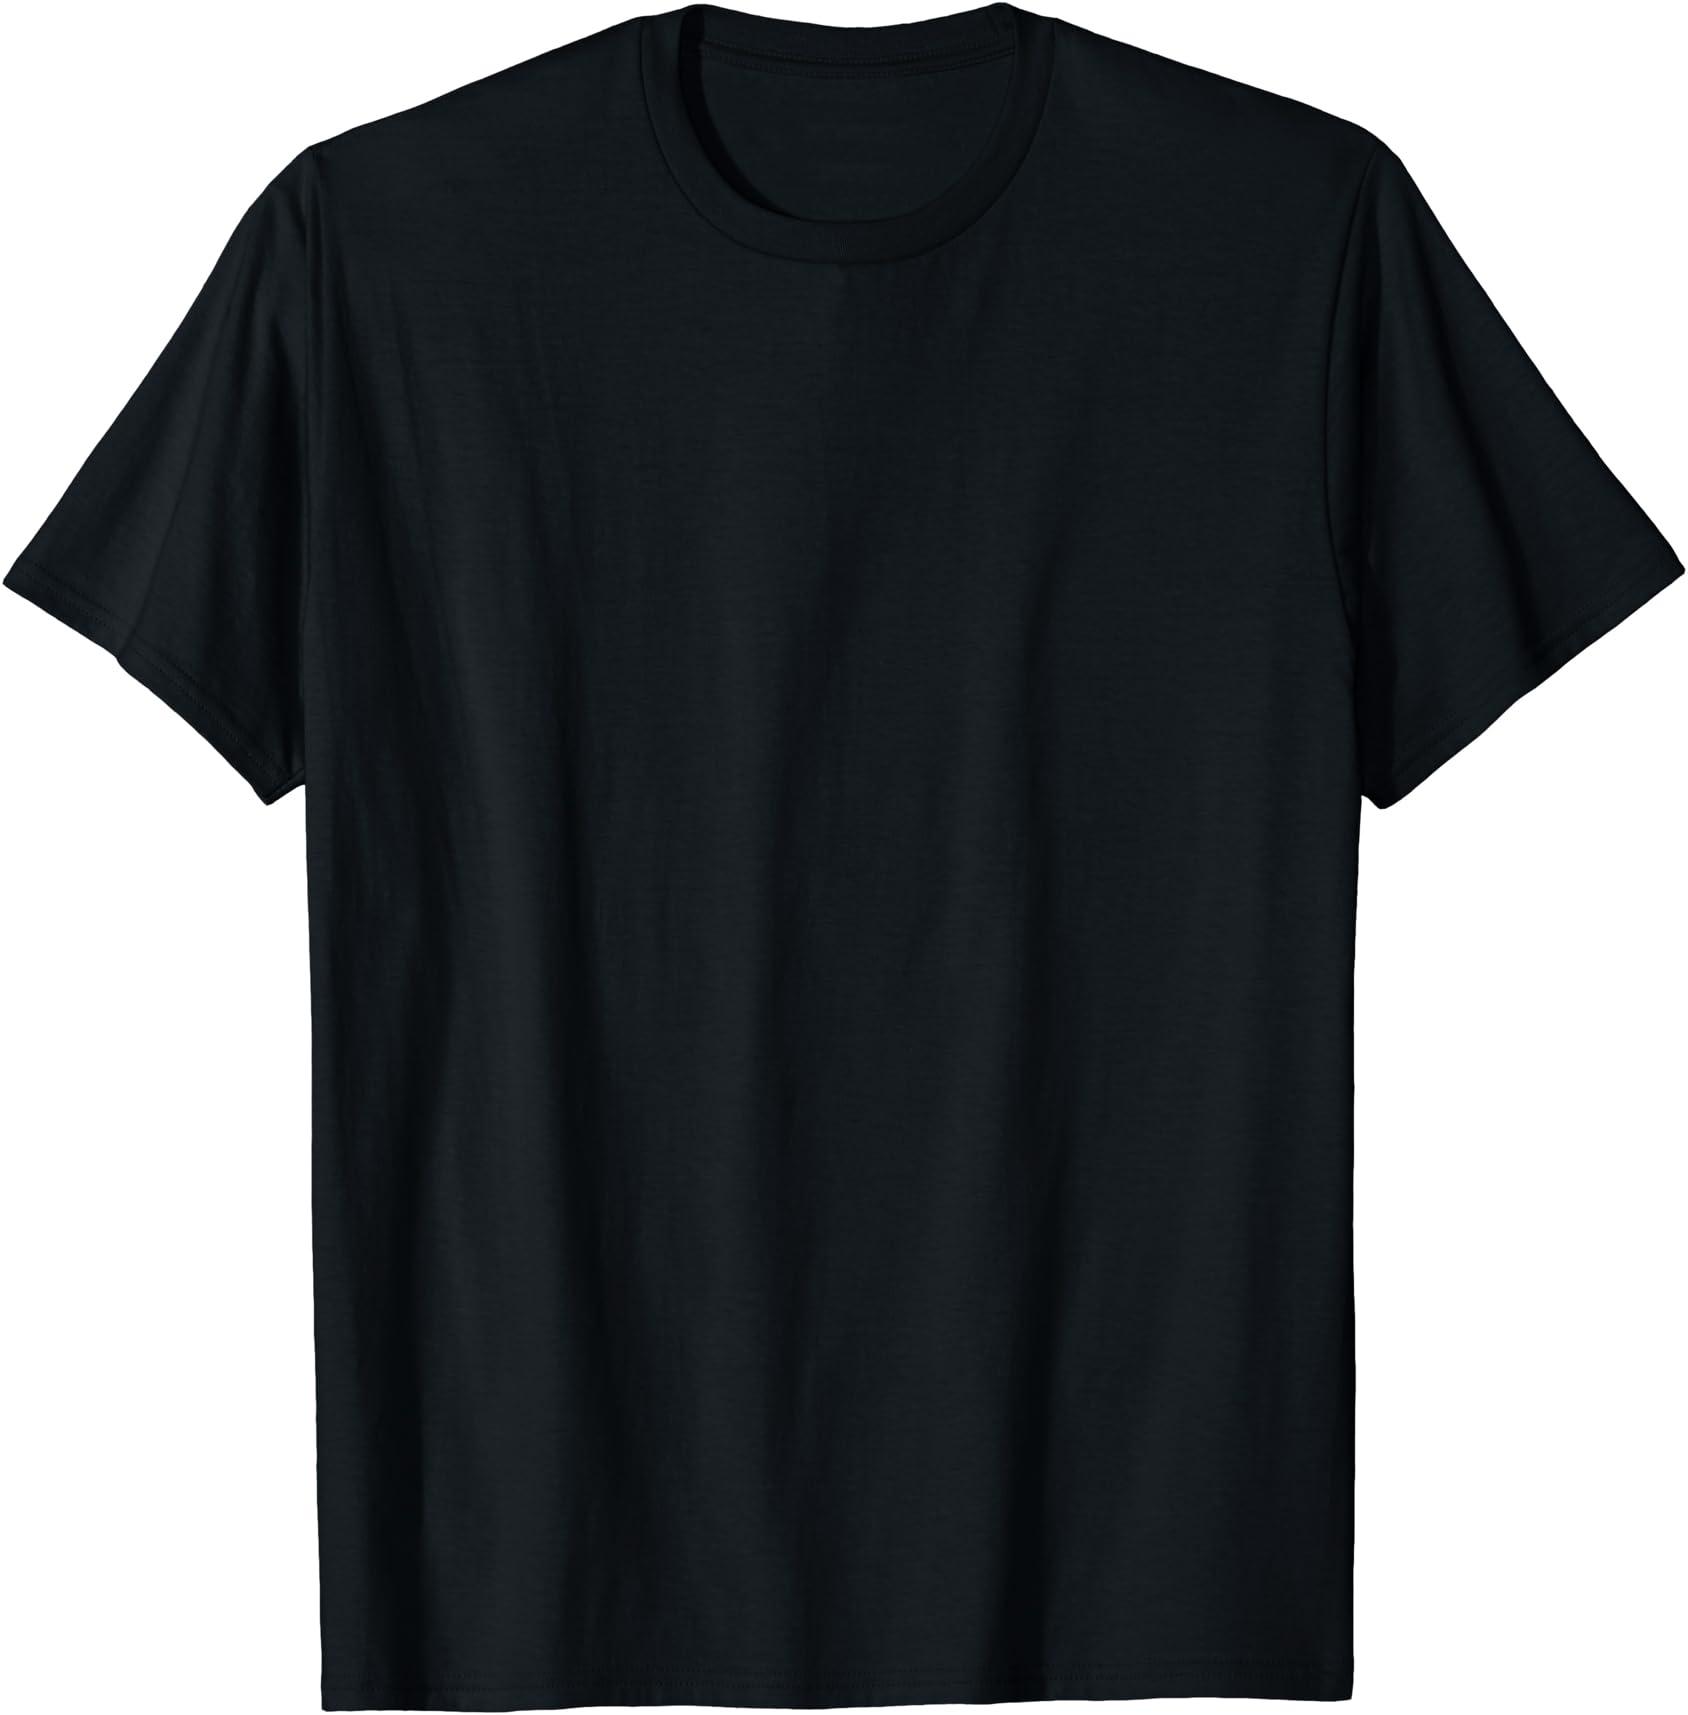 Too Cool For British Rule Shirt Hamilton Washington July 4th 100/% Cotton Funny